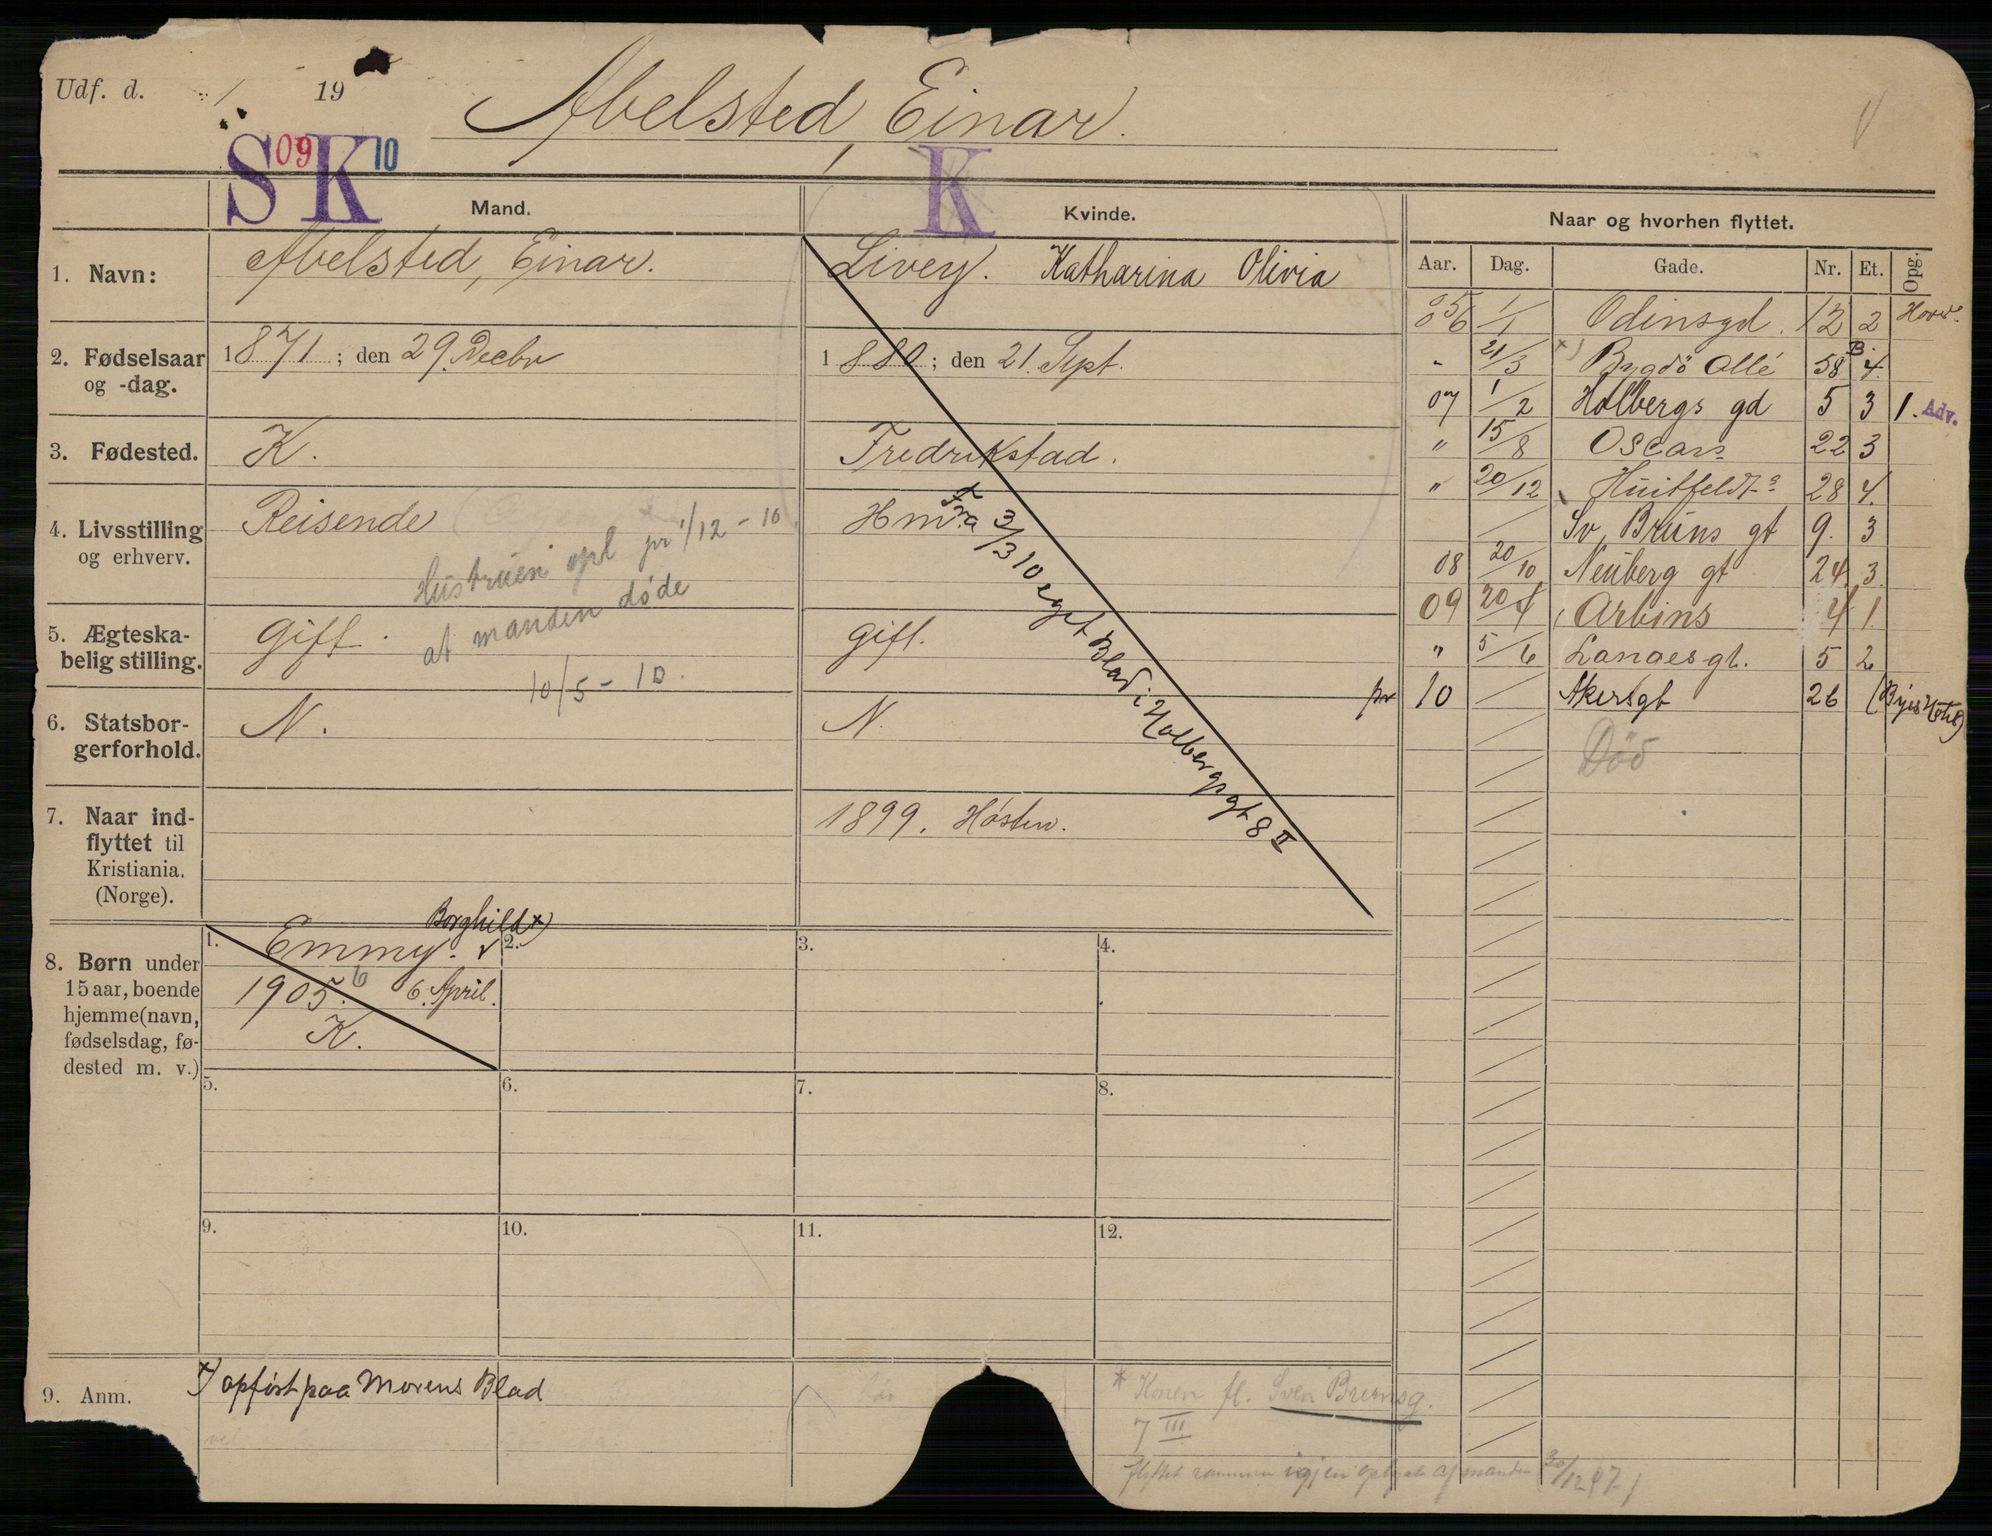 SAO, Oslo folkeregister, Registerkort, G/Gb/L0009: Menn, 1910